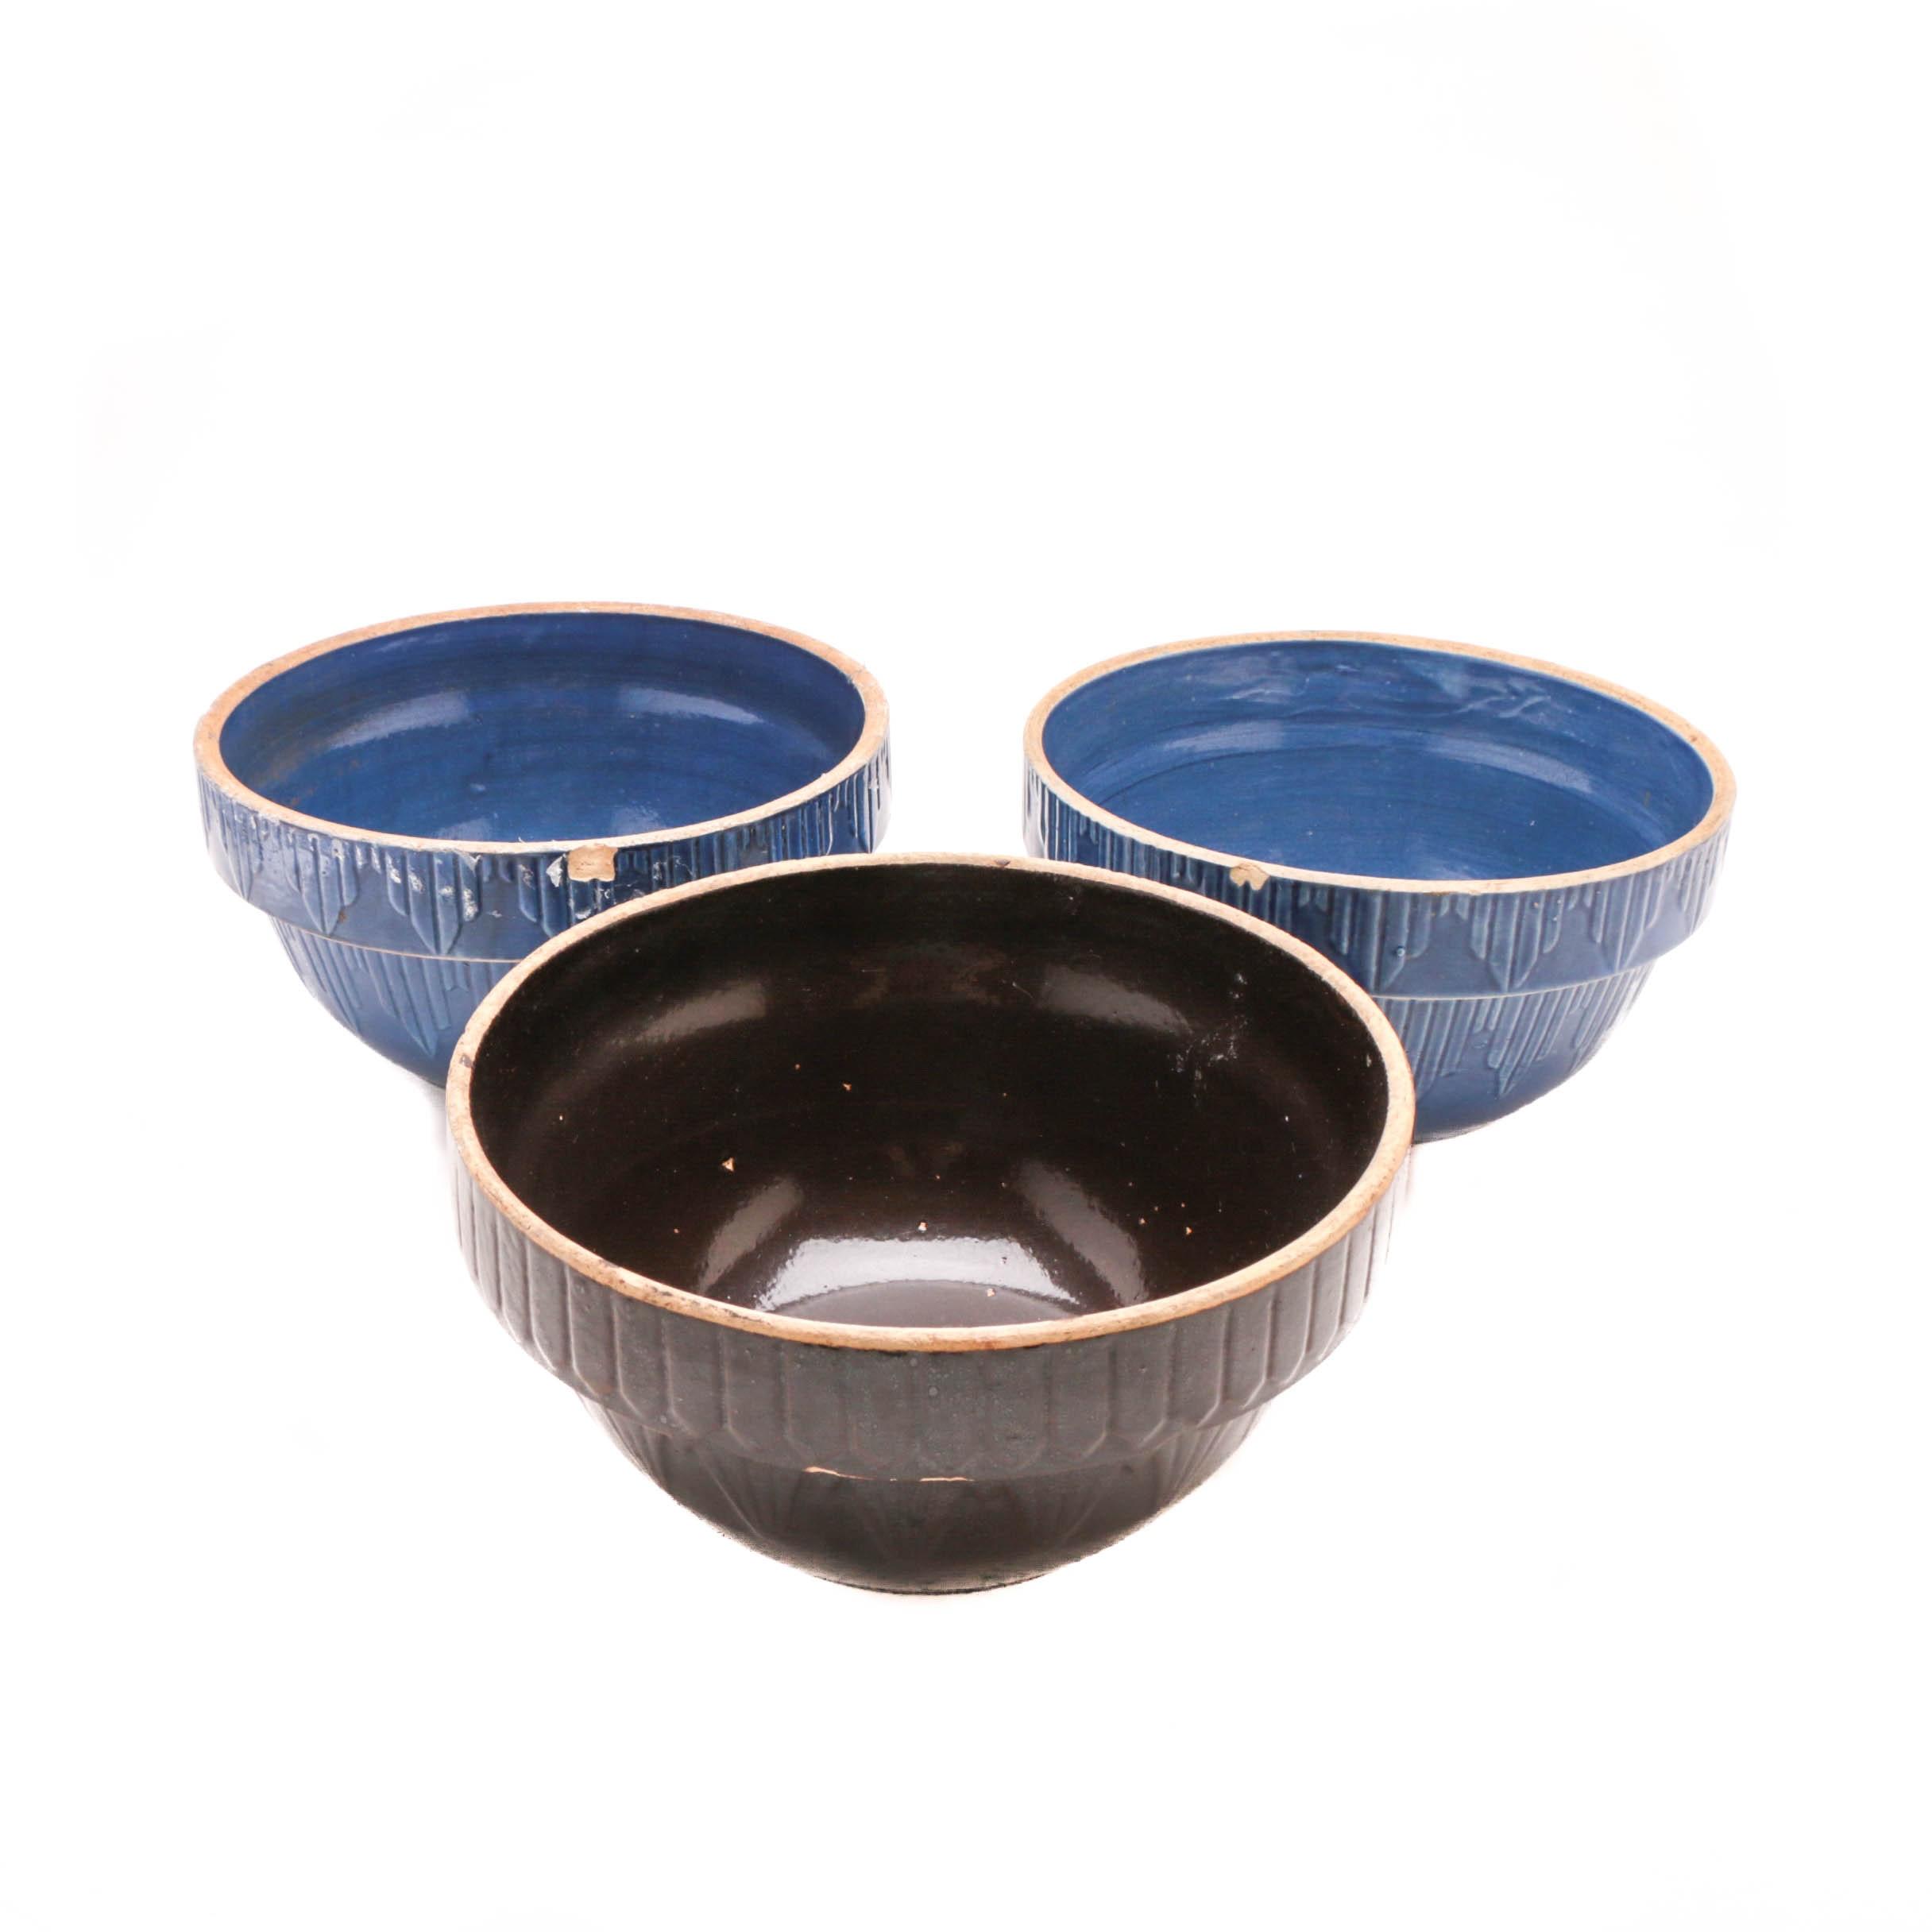 Three Art Deco Pottery Mixing Bowls